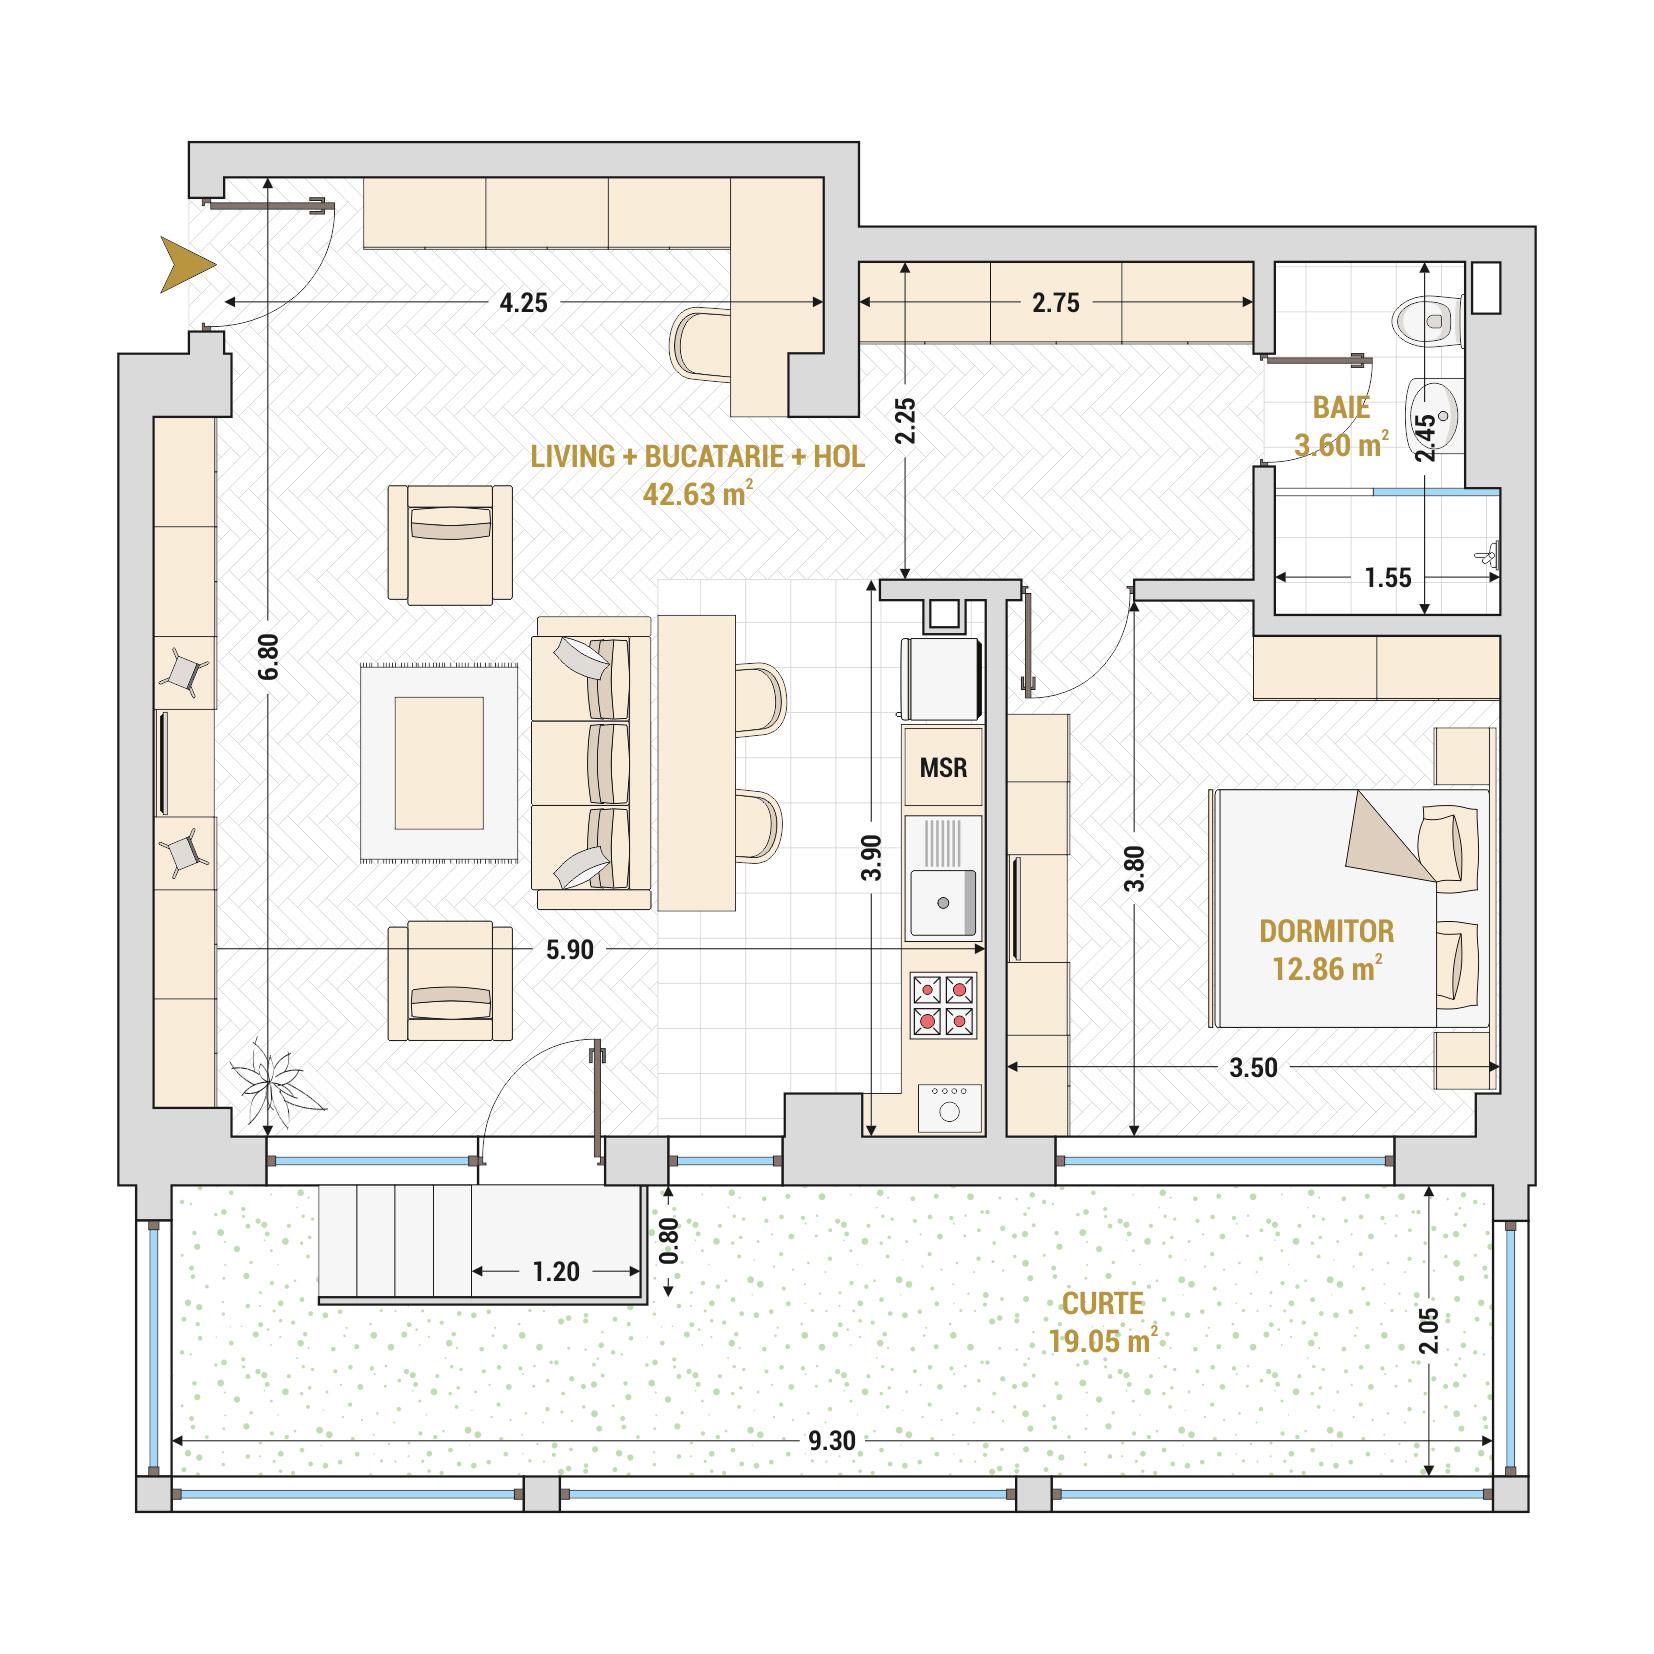 Apartamente cu 2 camere de vanzare Bucuresti - Catedral Residence - Marriott, Piata Unirii, 13 Septembrie, Izvor - Tip 8 - T1A